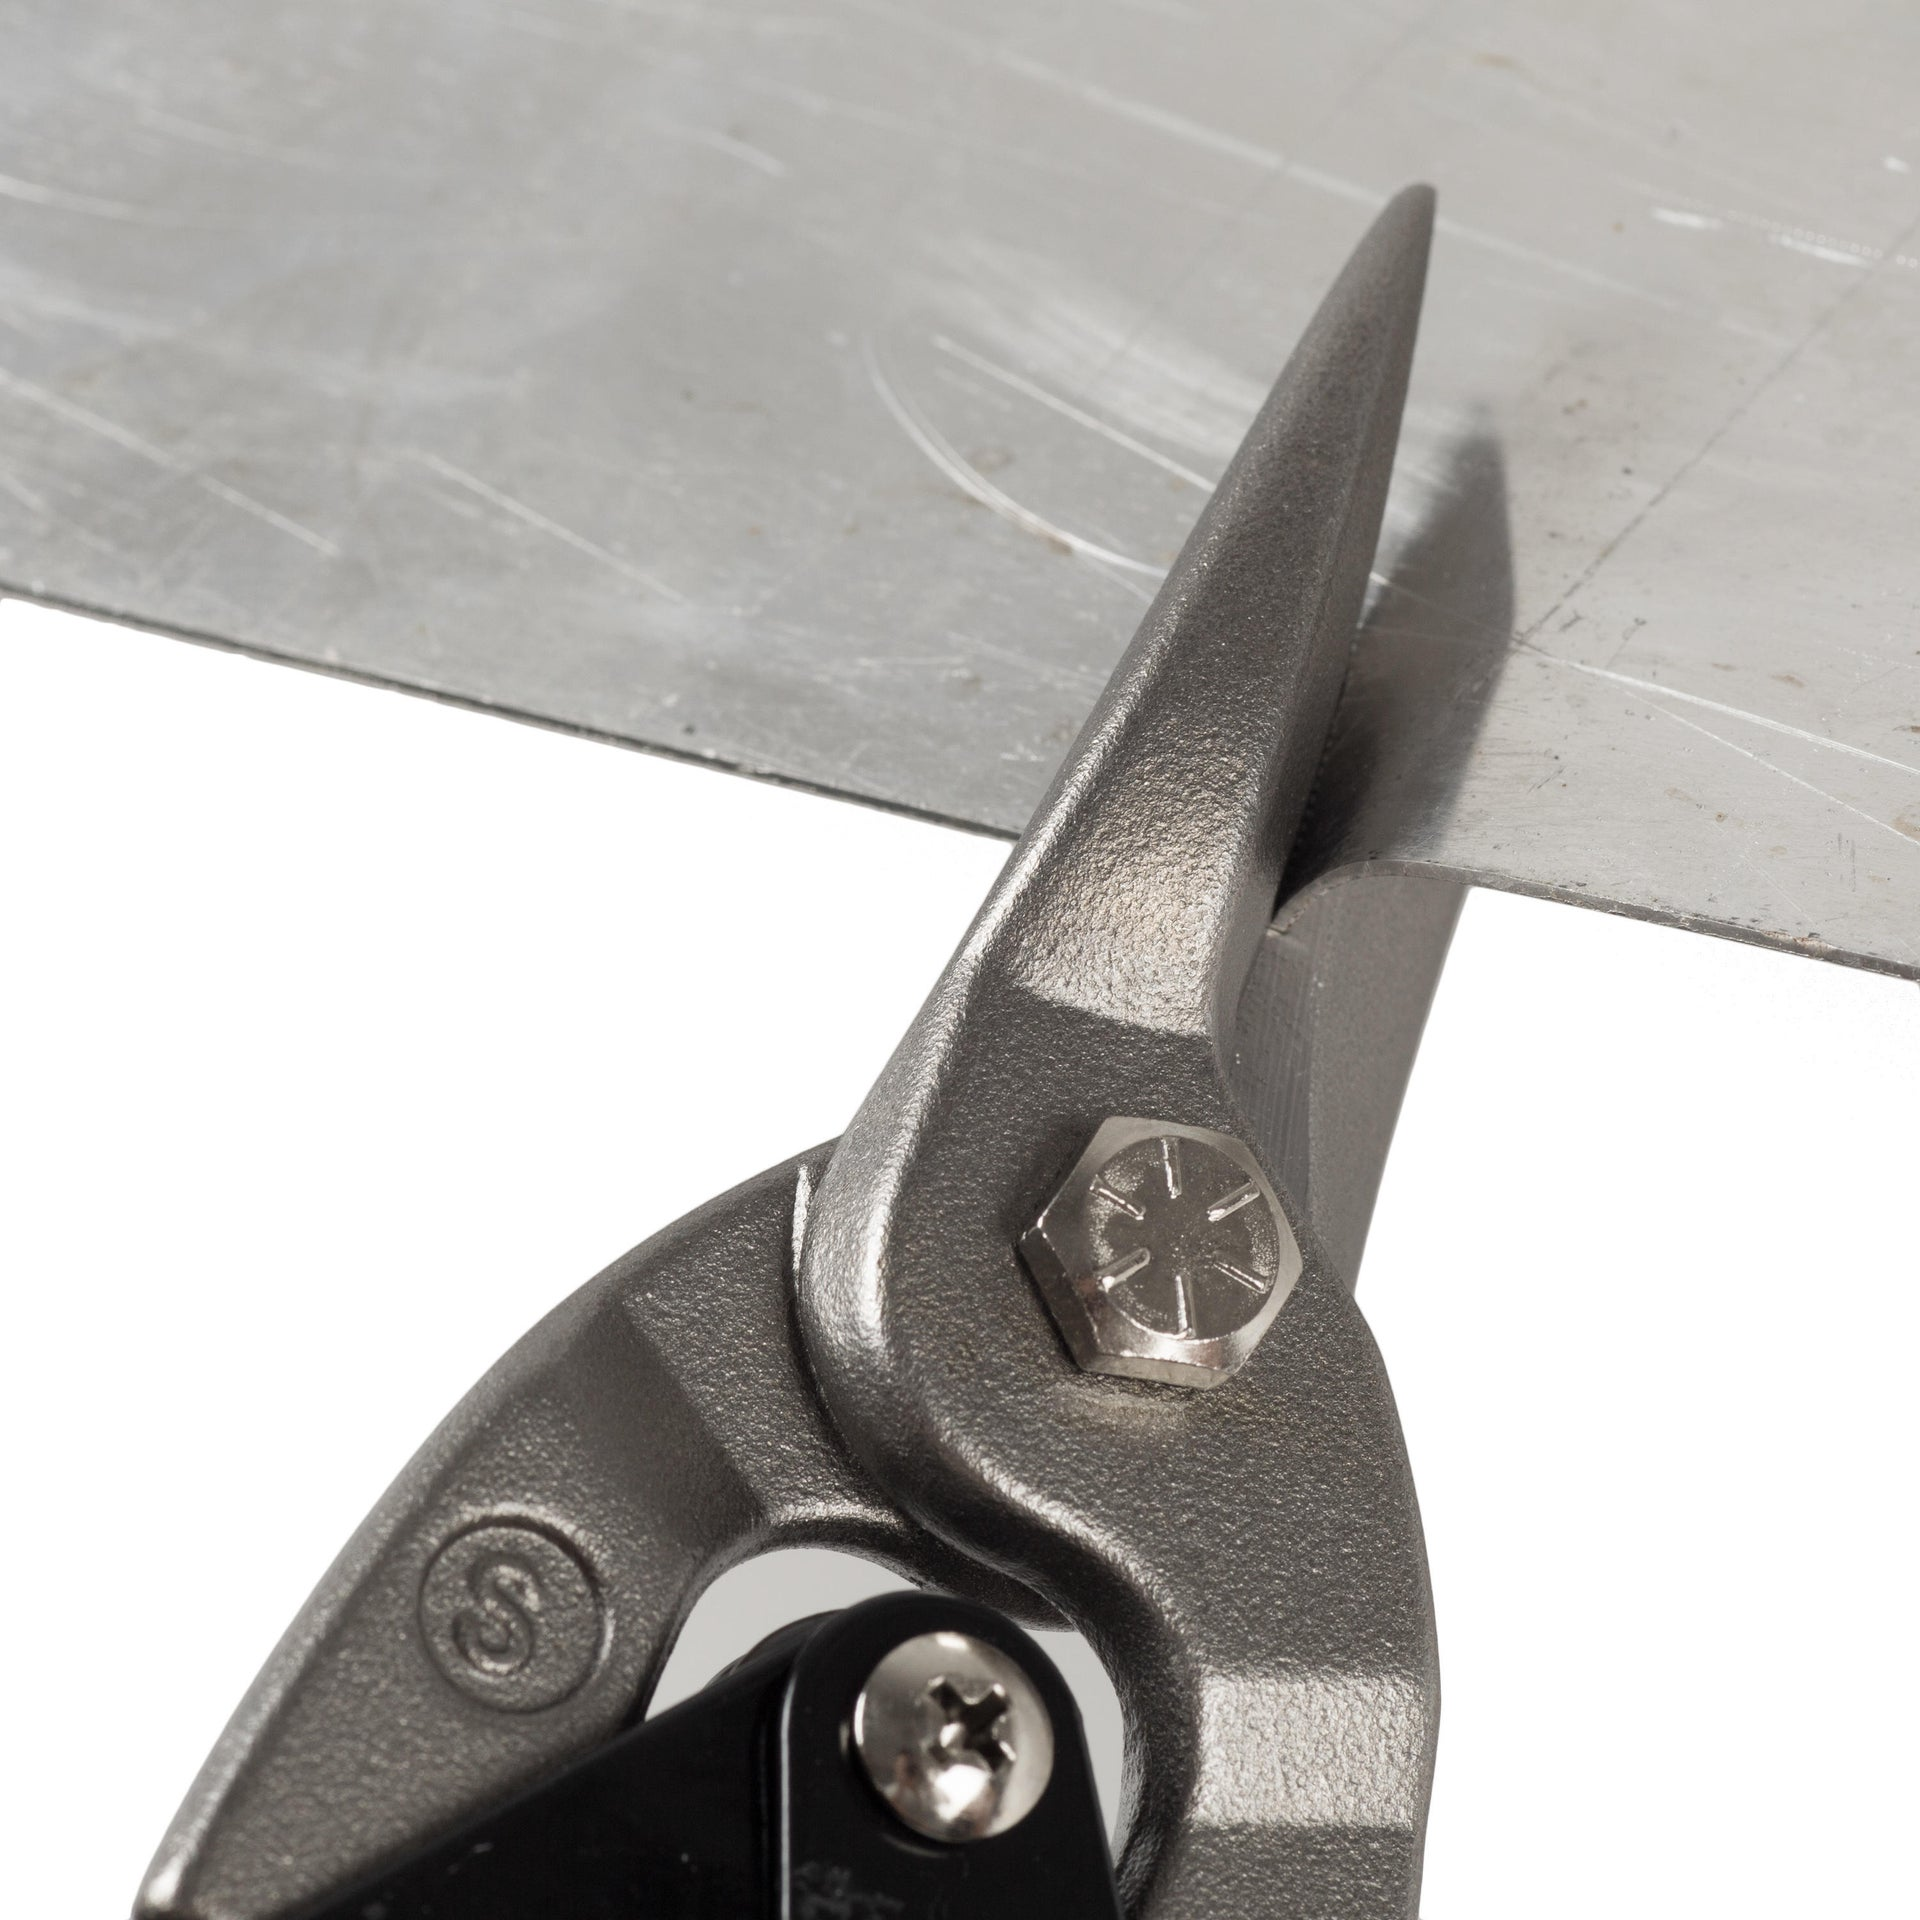 Cesoia per lamiera DEXTER taglio frontale 250 mm - 4